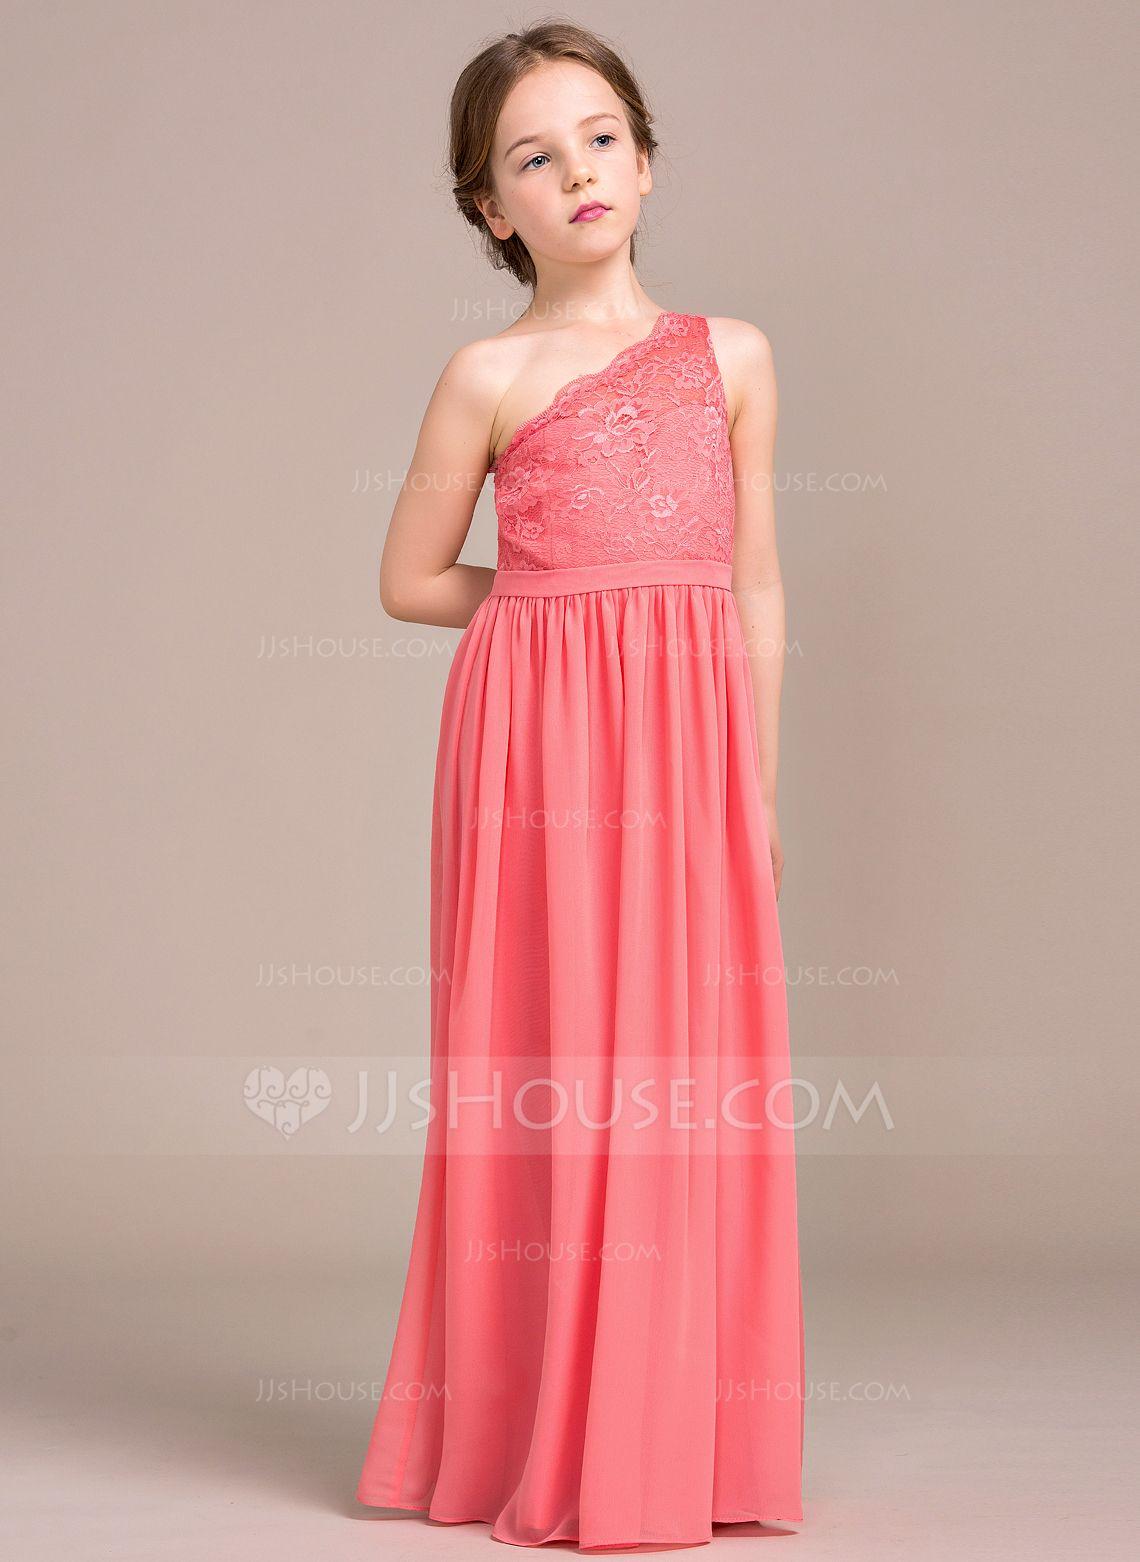 d5d460685cc A-Line/Princess One-Shoulder Floor-Length Zipper Up Regular Straps  Sleeveless No Watermelon General Chiffon Lace Junior Bridesmaid Dress